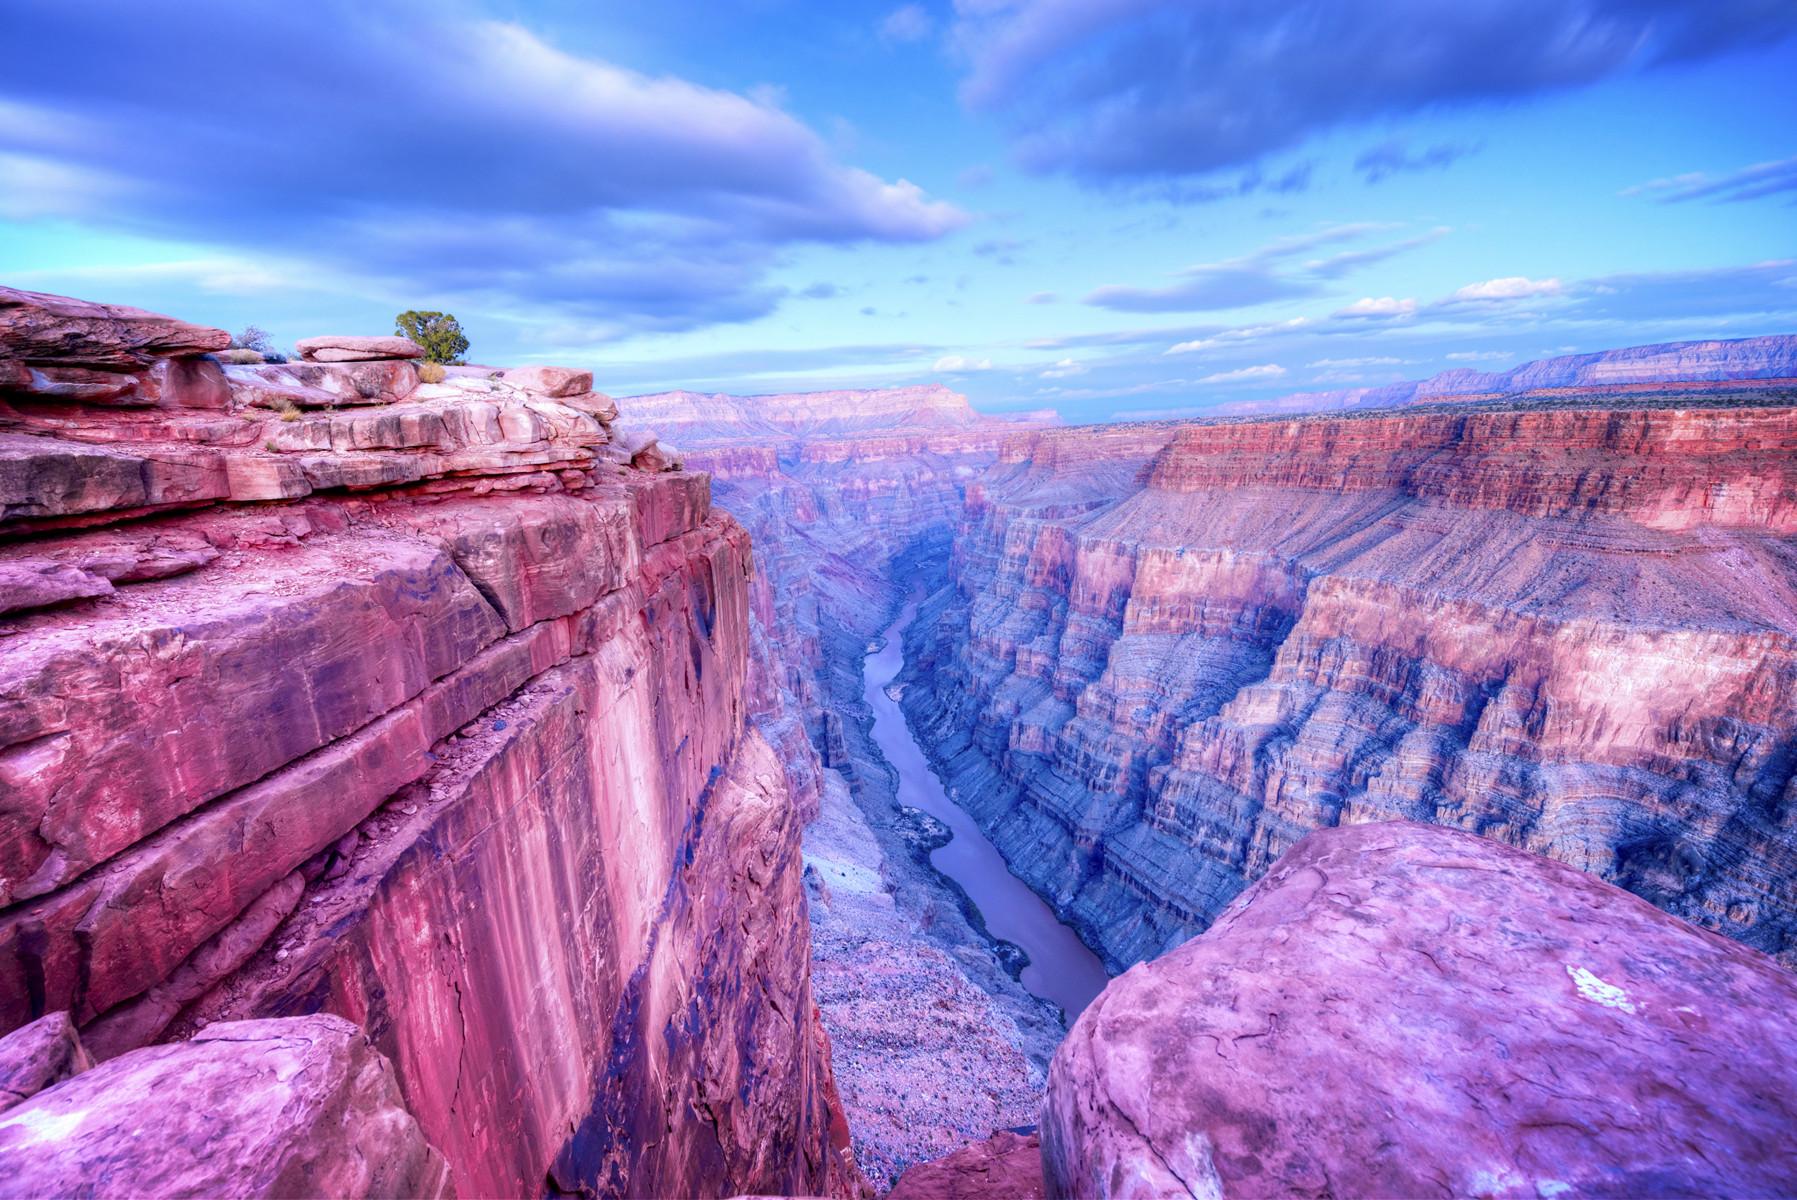 1-Day Grand Canyon National Park Bus Tour - Tours4Fun